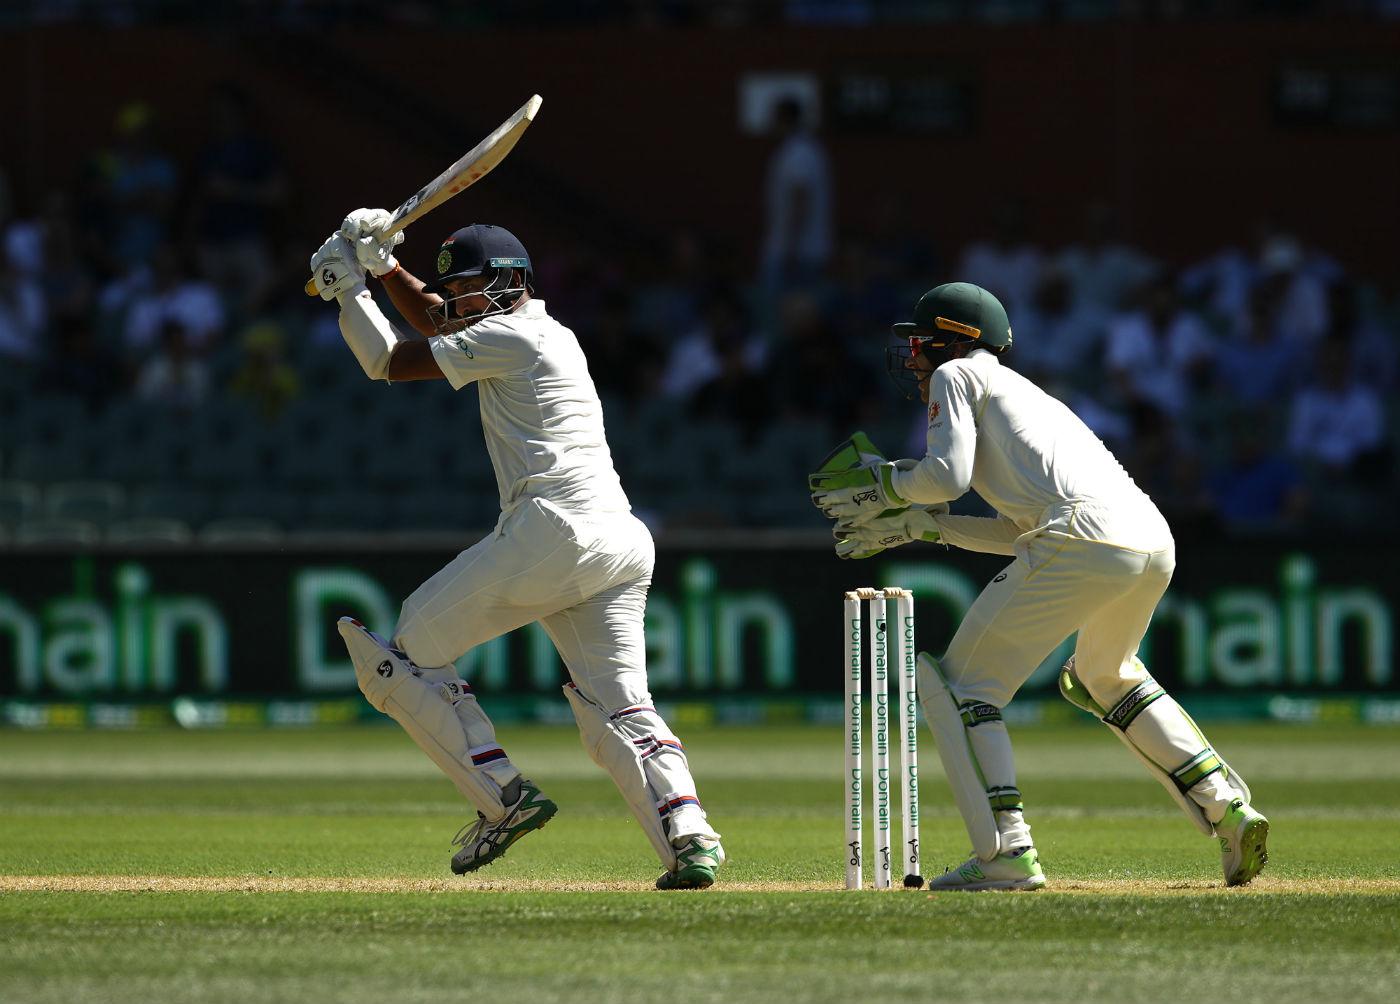 'RESPECT', Says Kevin Pietersen As He Hails Cheteshwar Pujara 1